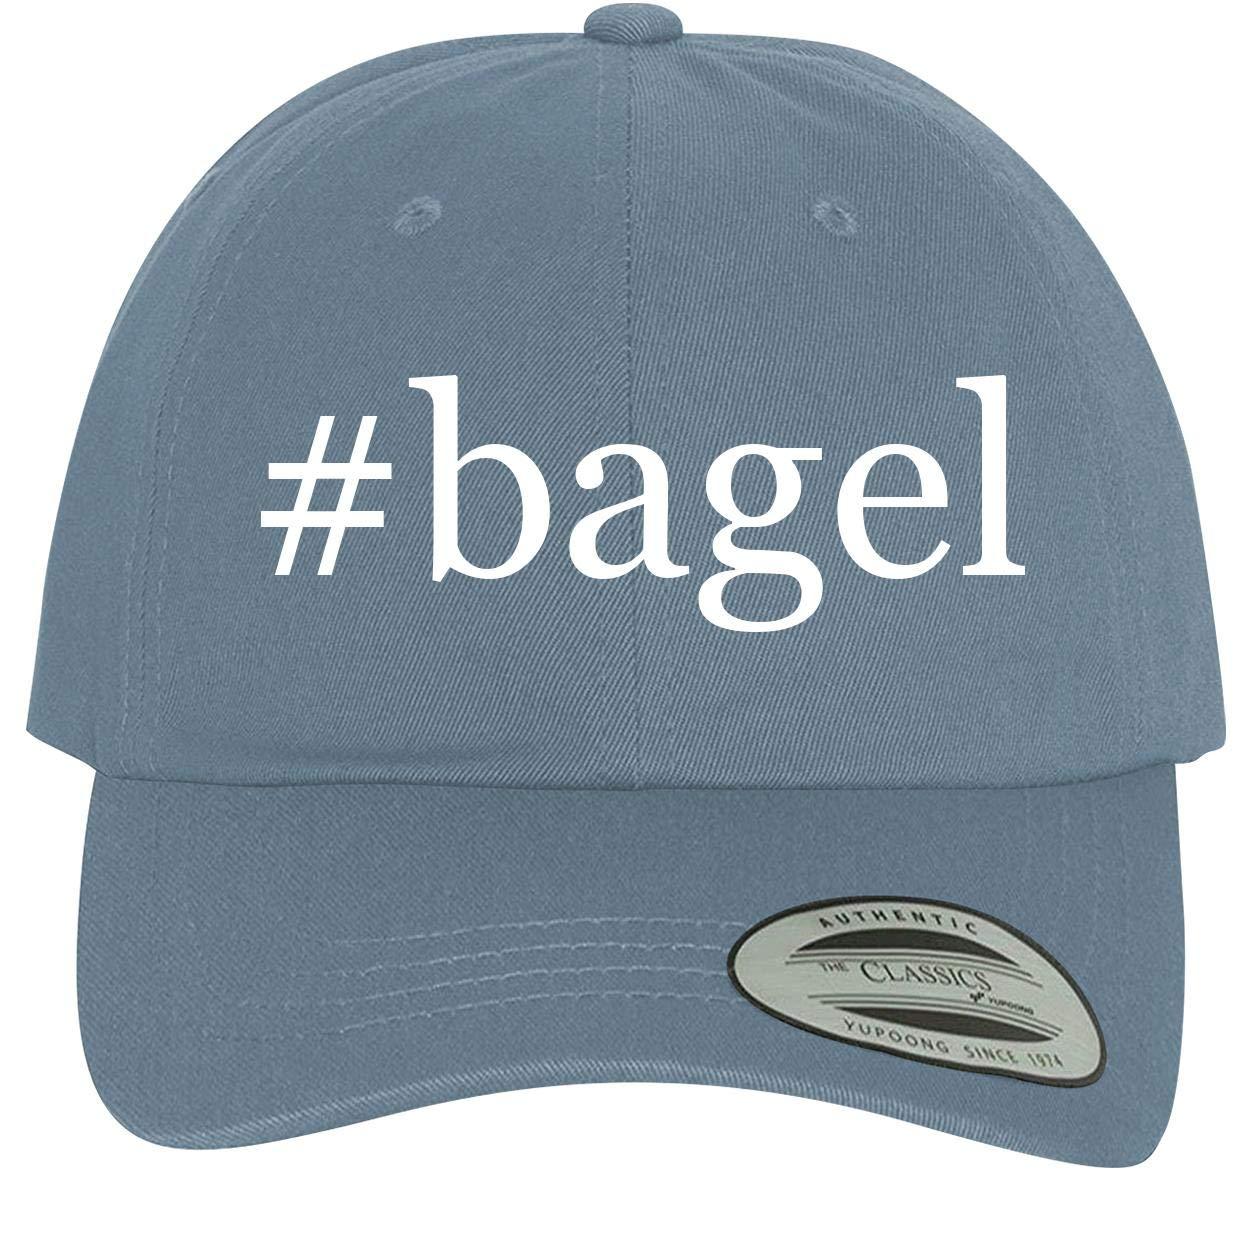 Comfortable Dad Hat Baseball Cap BH Cool Designs #Bagel